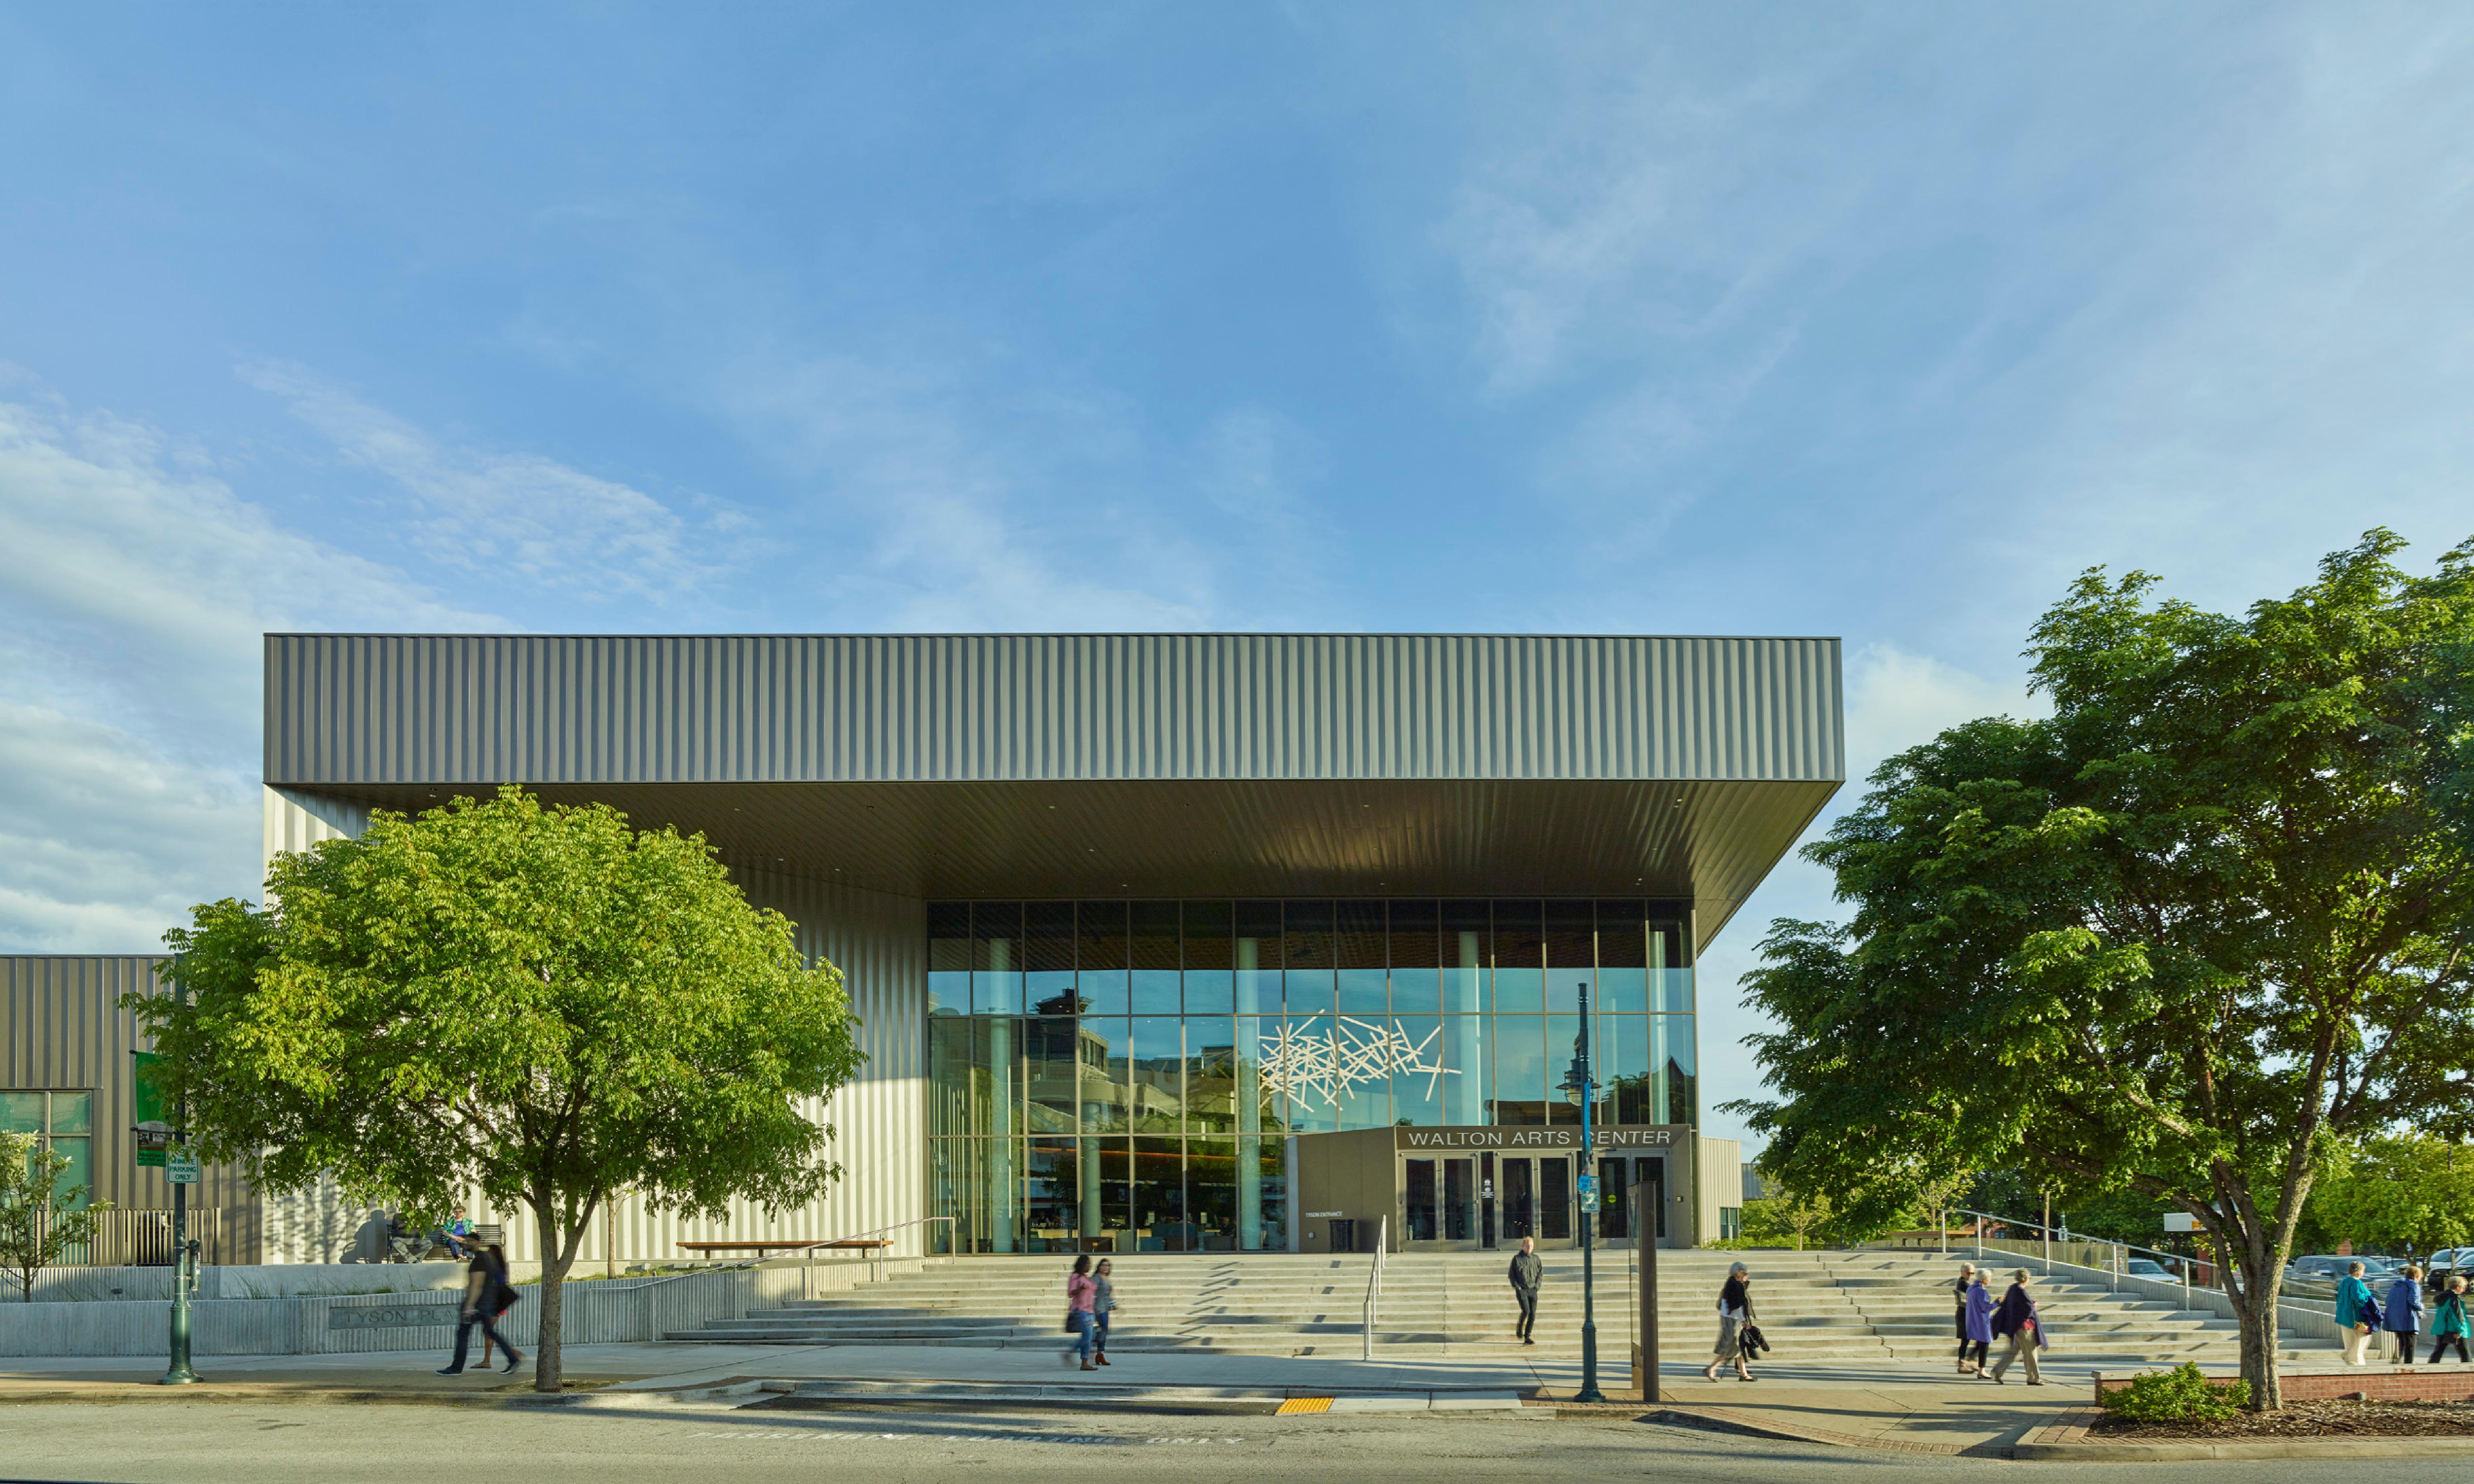 Walton Arts Center Expansion & Renovation